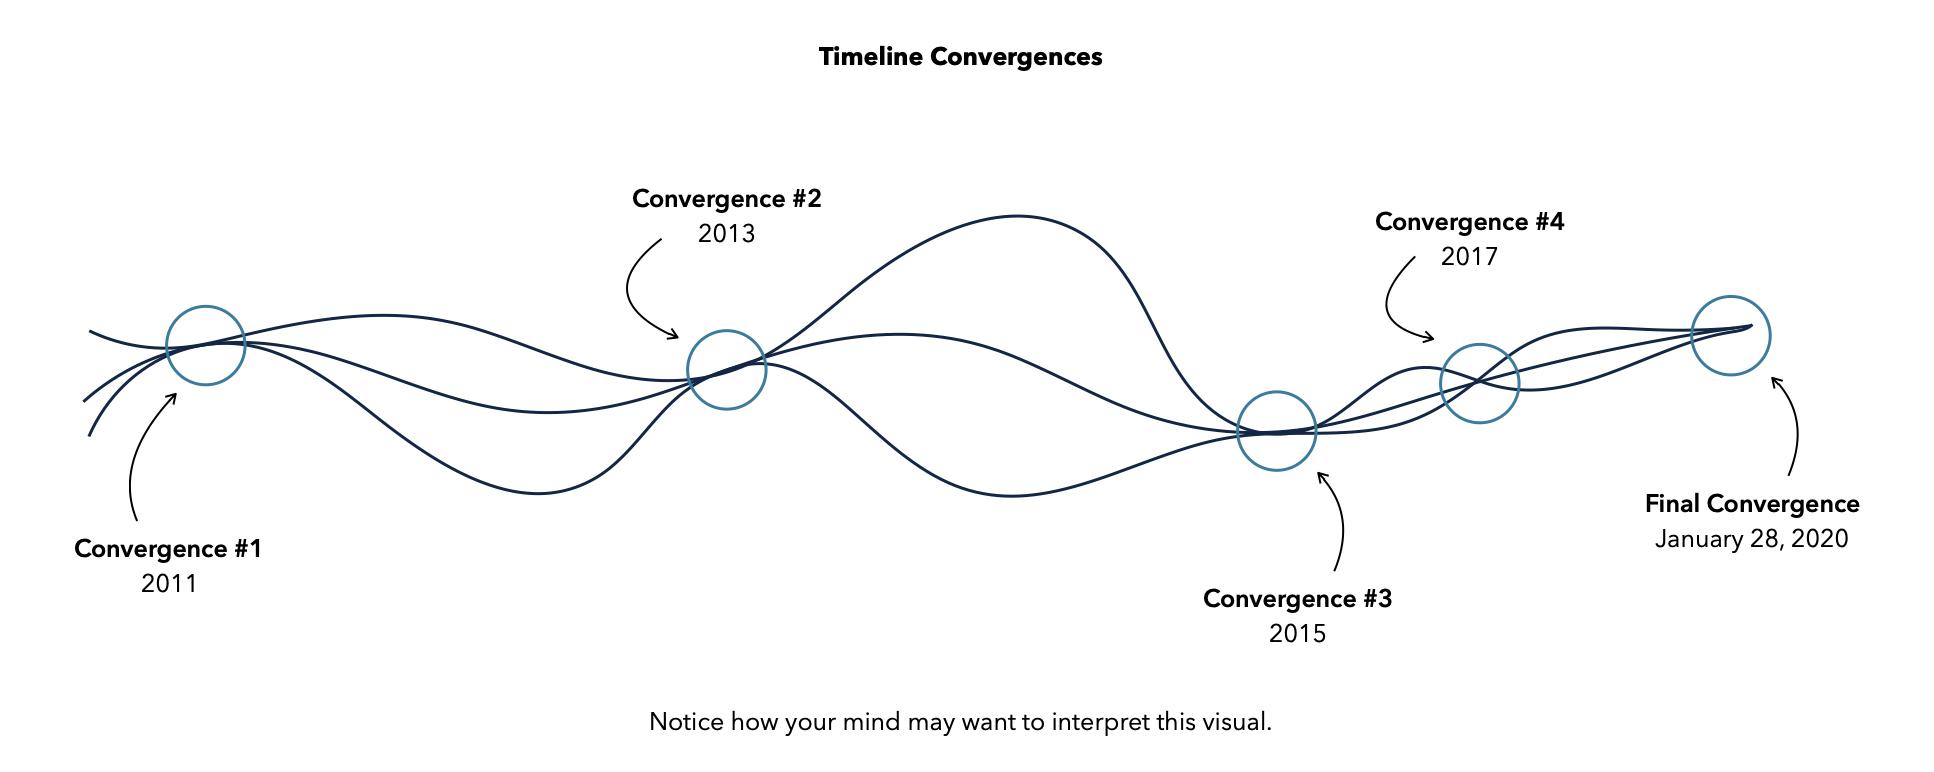 Timeline Convergences